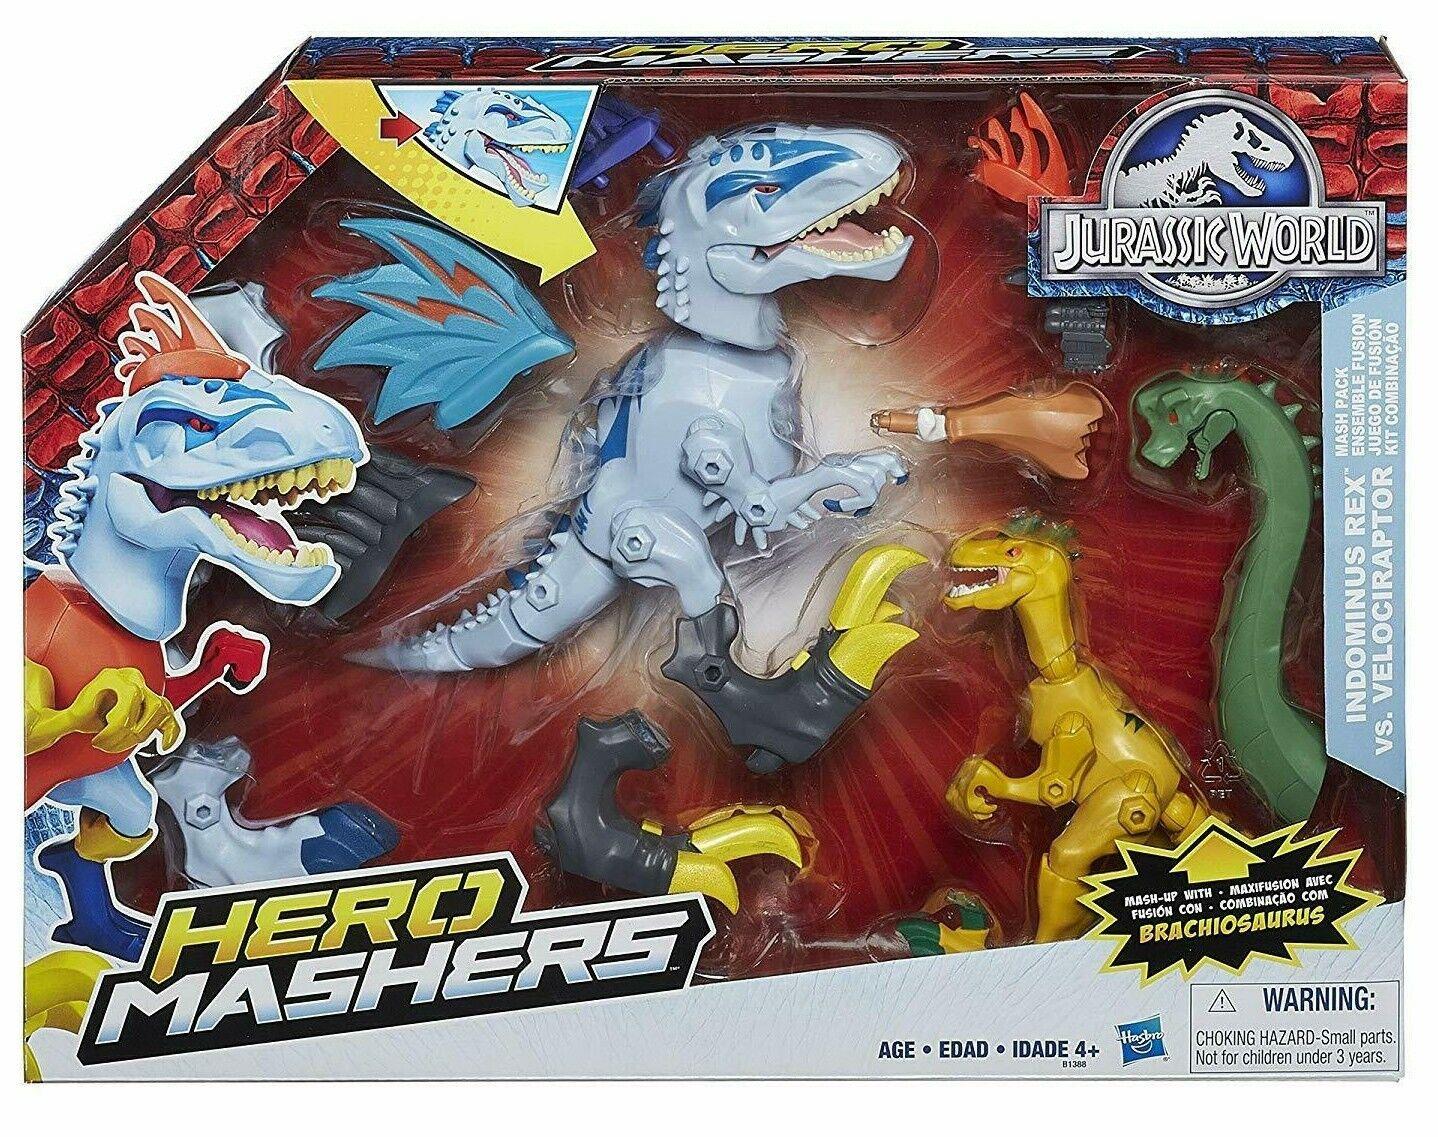 Jurassic World Héroe Mashers indominus Rex Vs. Velociraptor Parque Hasbro Nuevo Raro